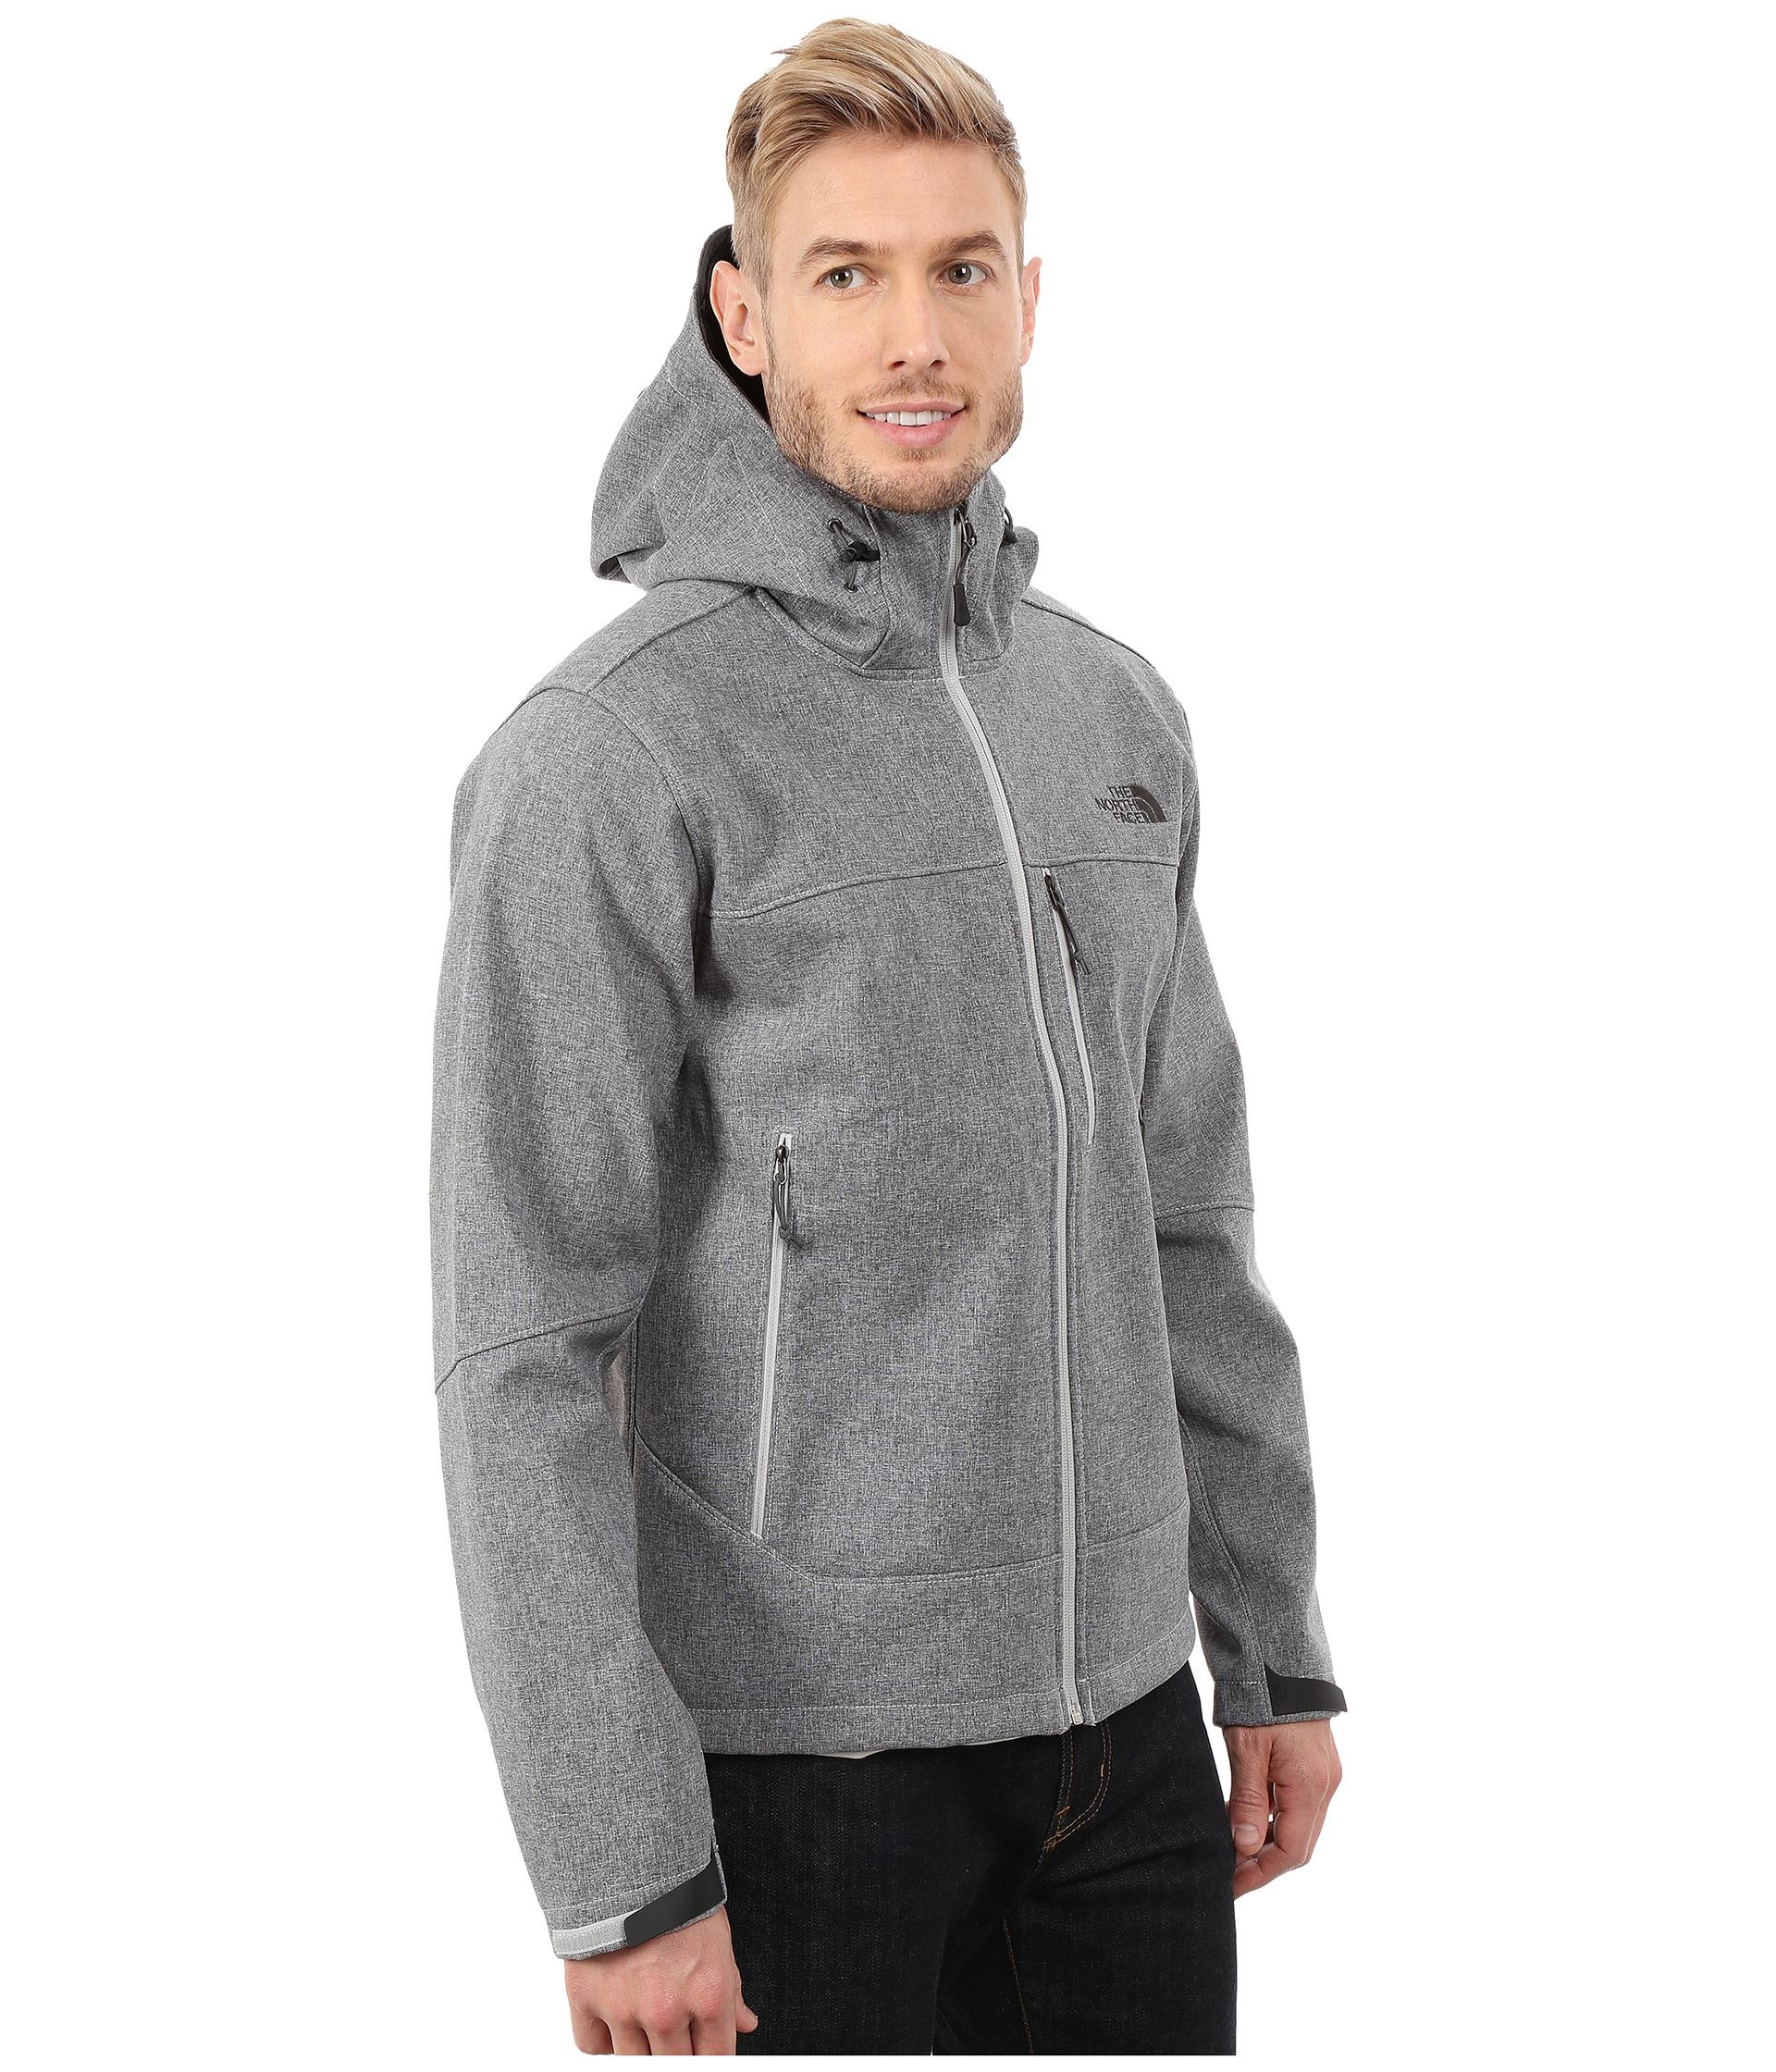 North face apex bionic hoodie